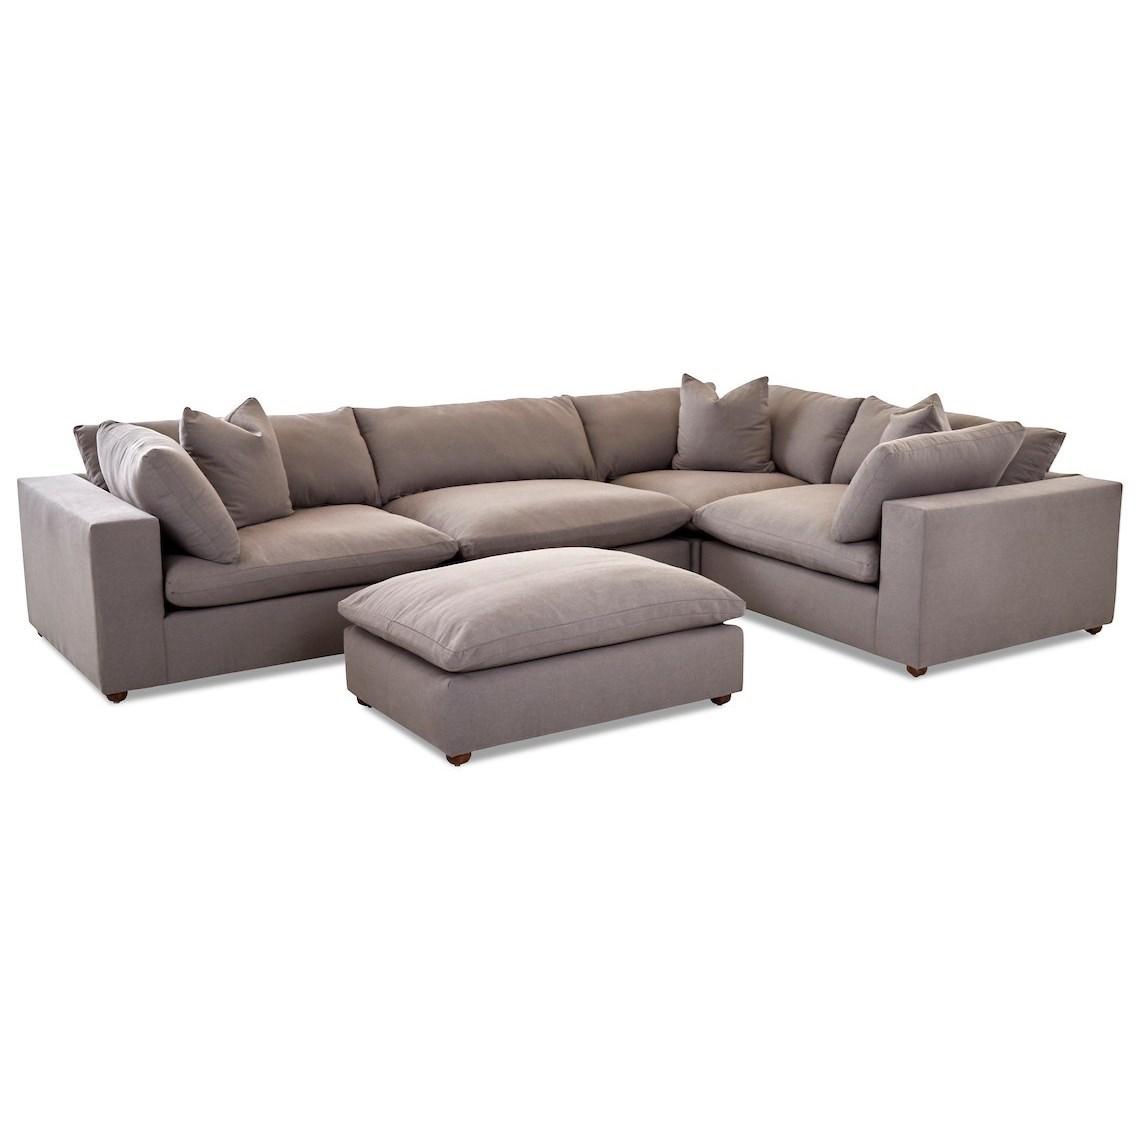 Living Room Group with Ottoman